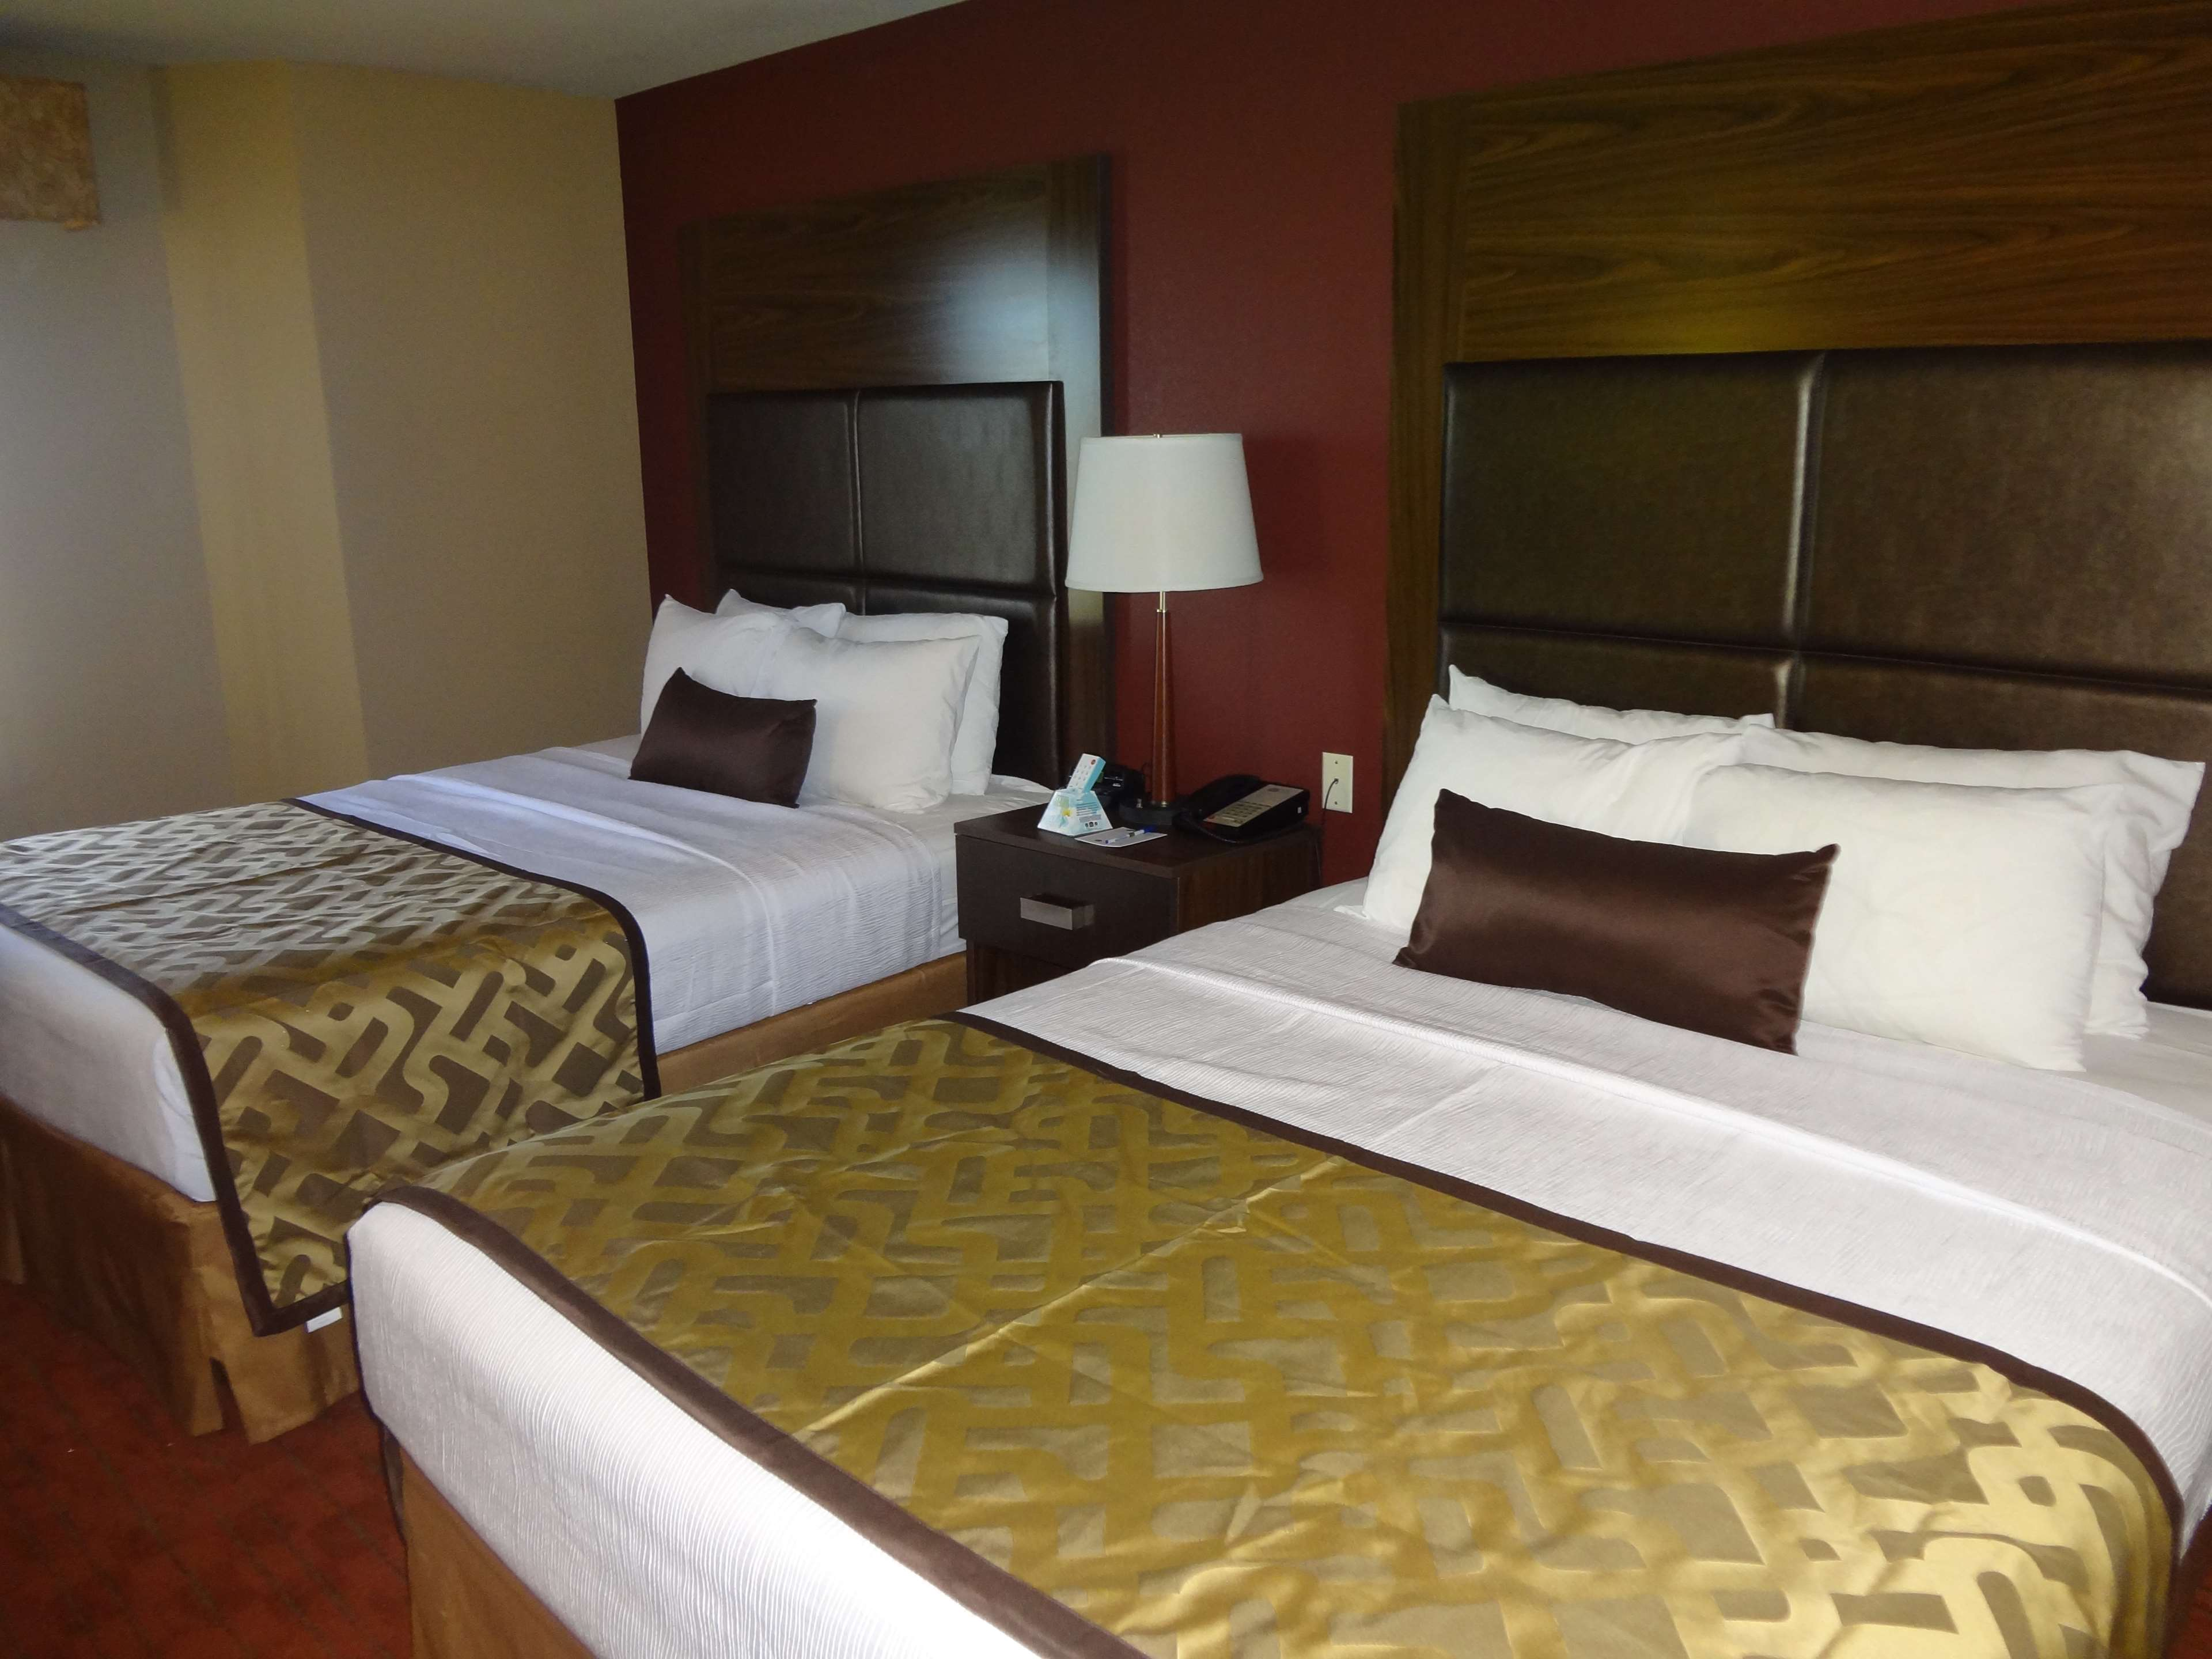 Best Western Plus Woodland Hills Hotel & Suites image 45